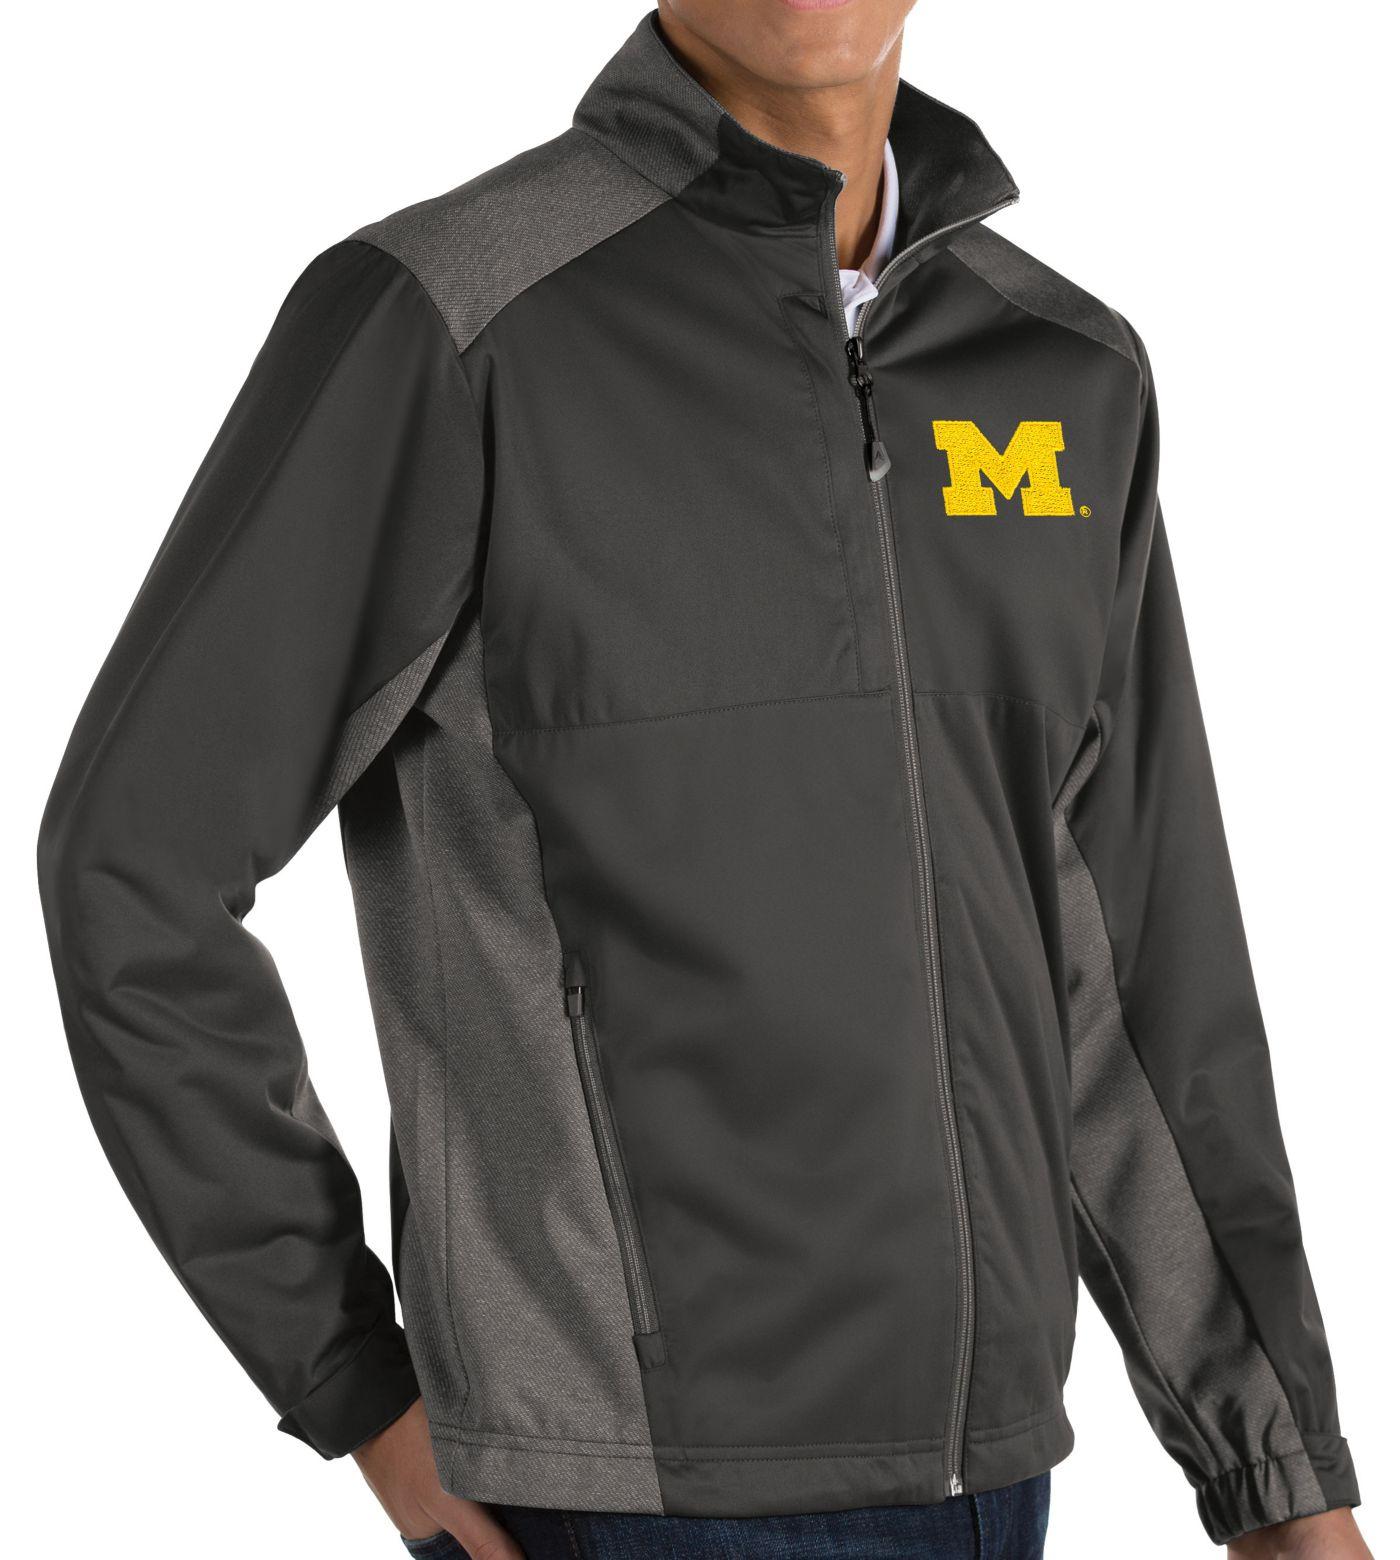 Antigua Men's Michigan Wolverines Grey Revolve Full-Zip Jacket